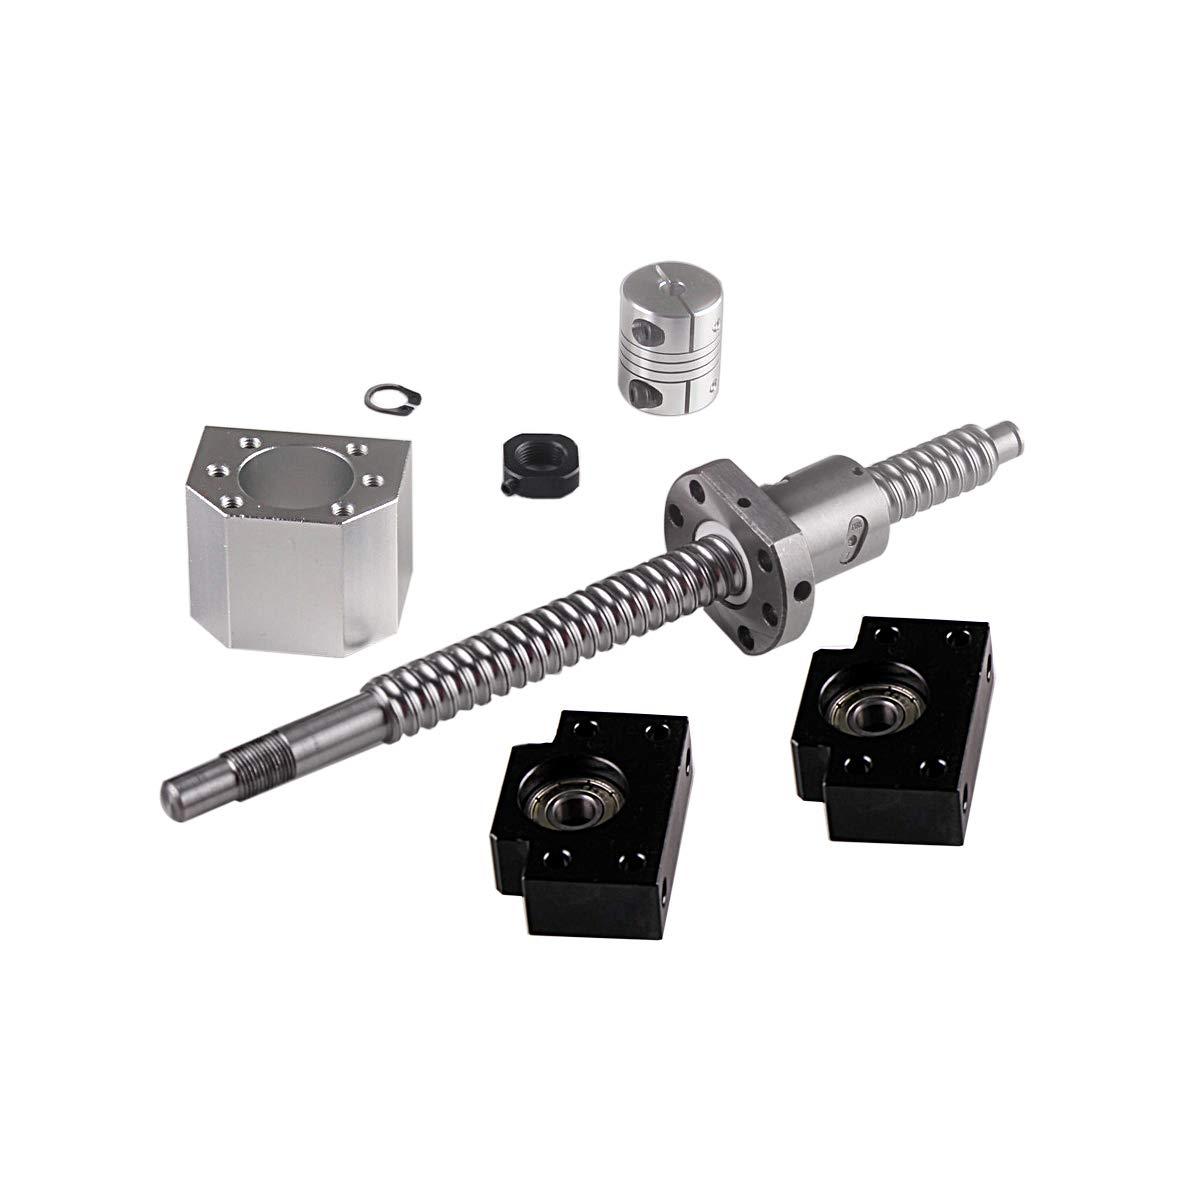 BallScrew 1605-700mm End Machine CNC Couplers with Ballnut Housing /& BK//BF12